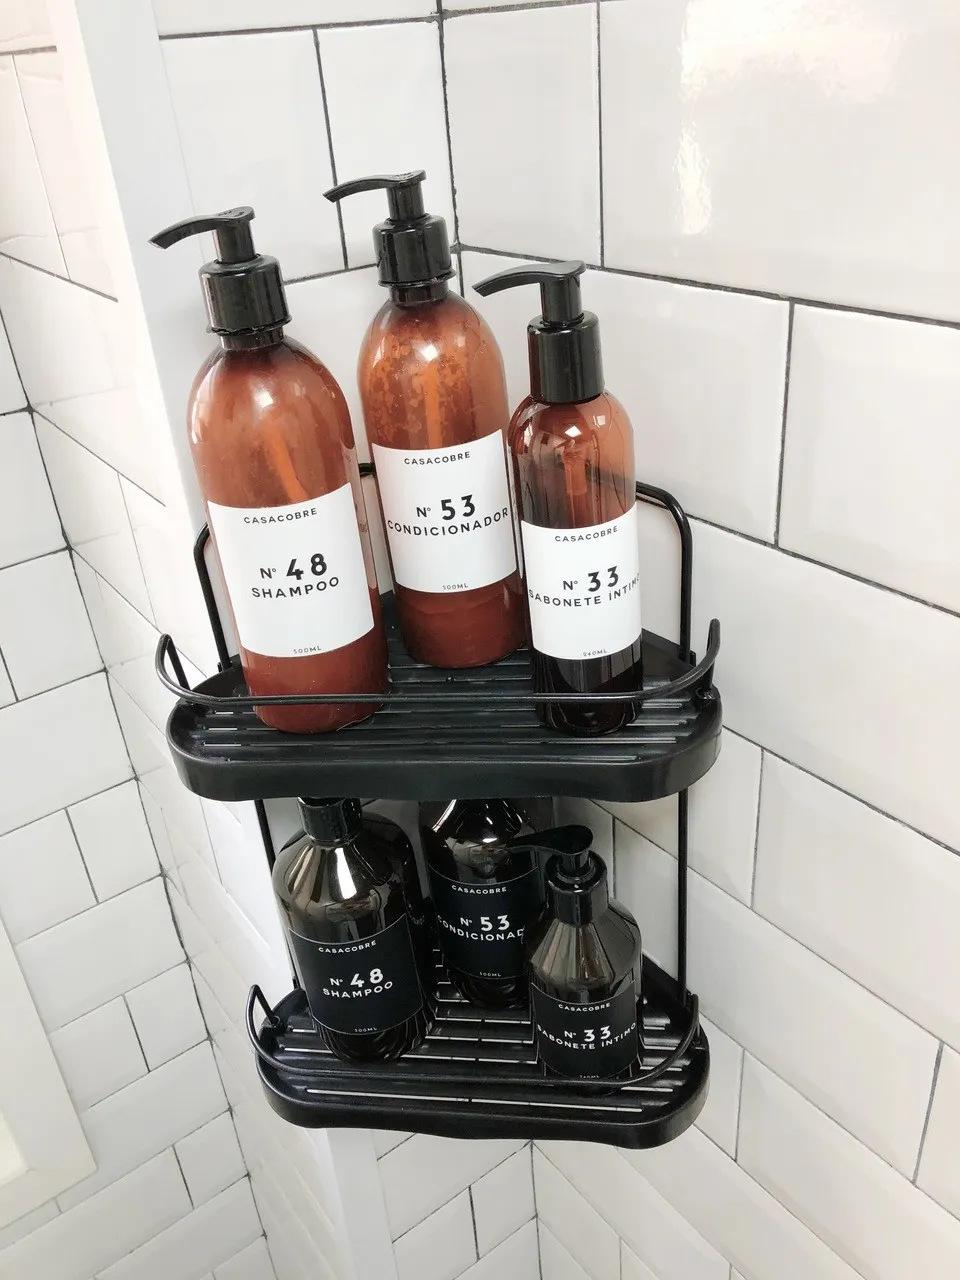 Porta Shampoo Duplo de Canto  - CASACOBRE